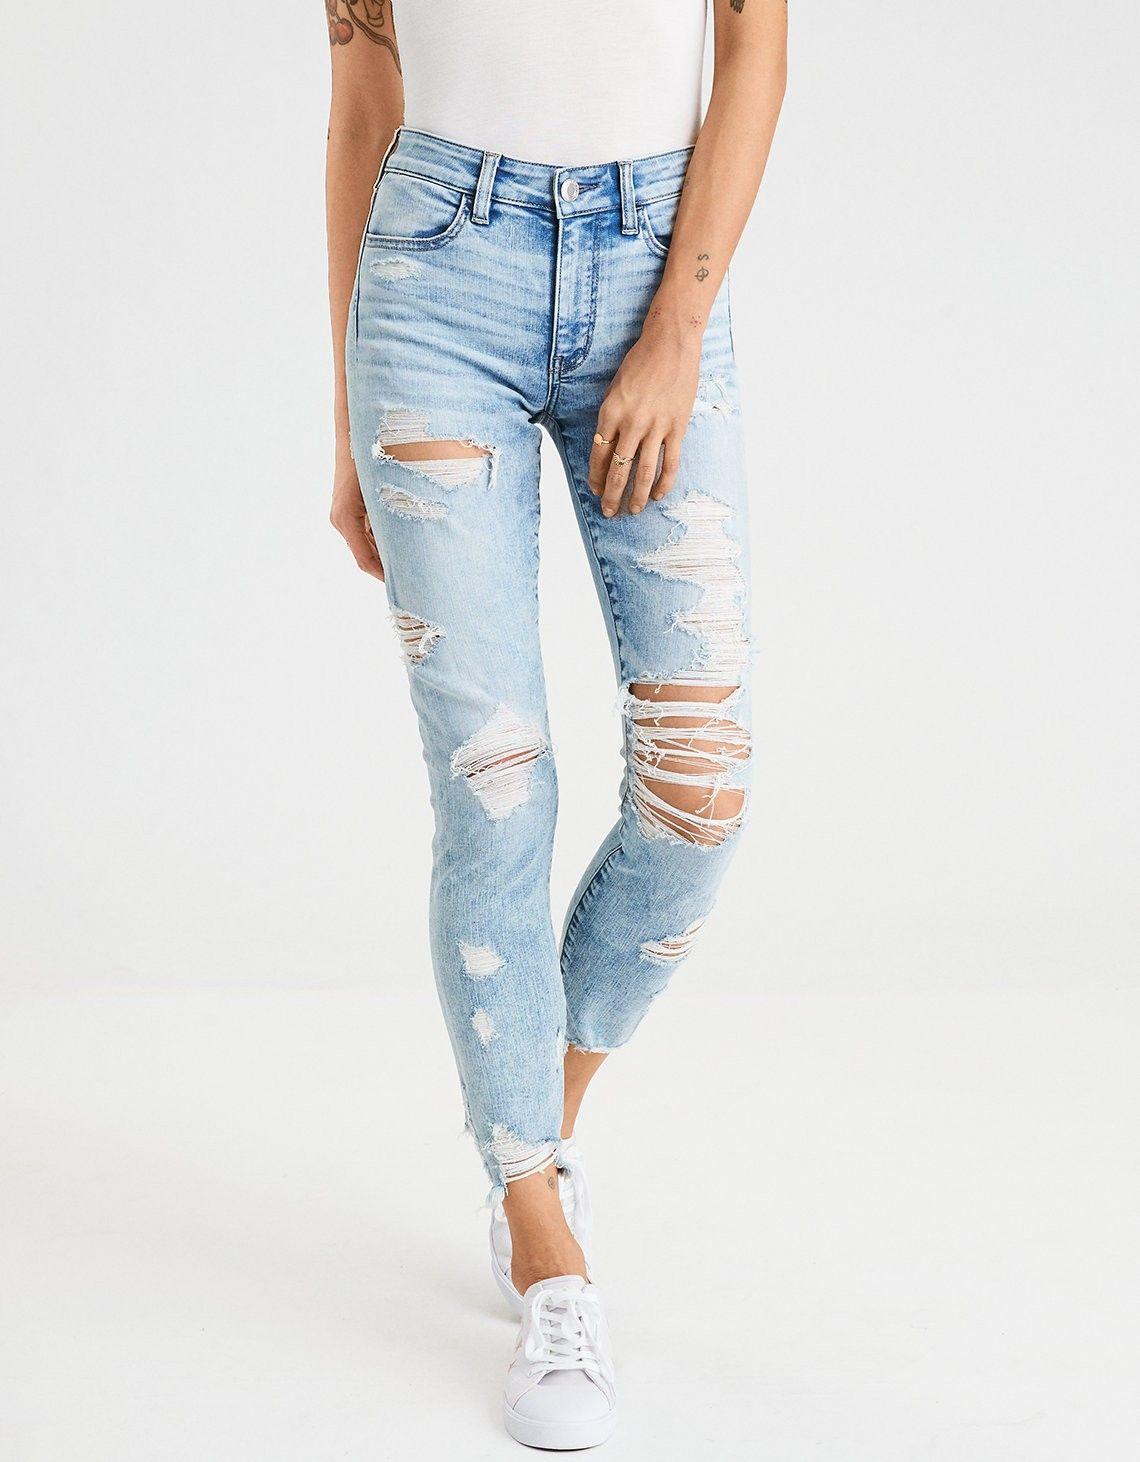 Very Guess Pantalones Shop 95f09 Db0f8